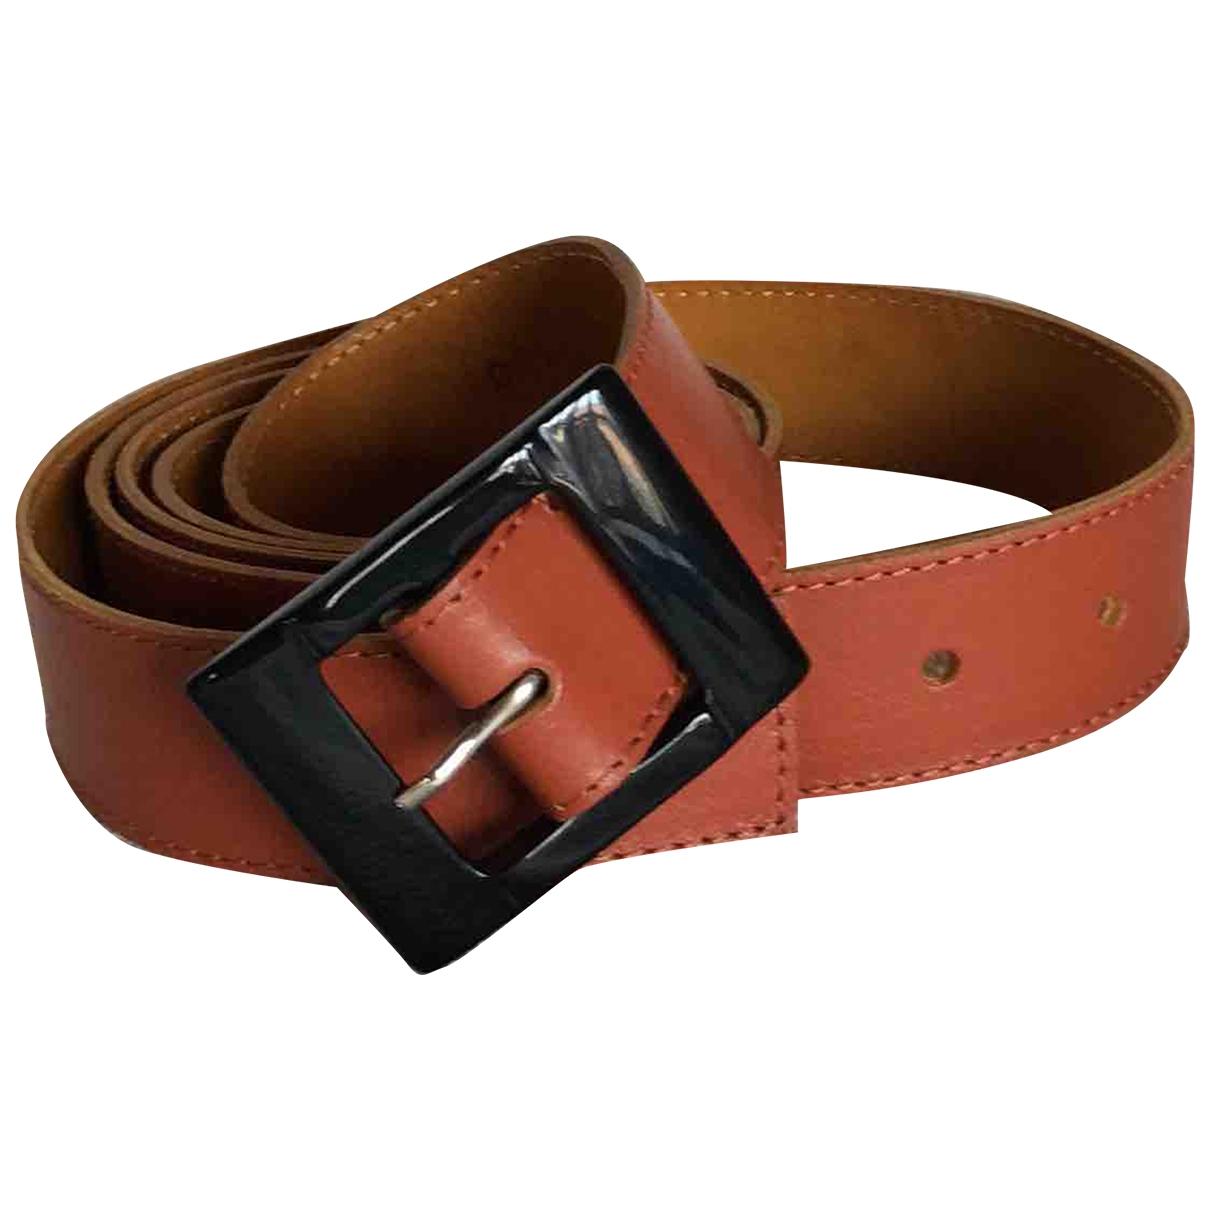 Cinturon de Cuero Marni For H&m